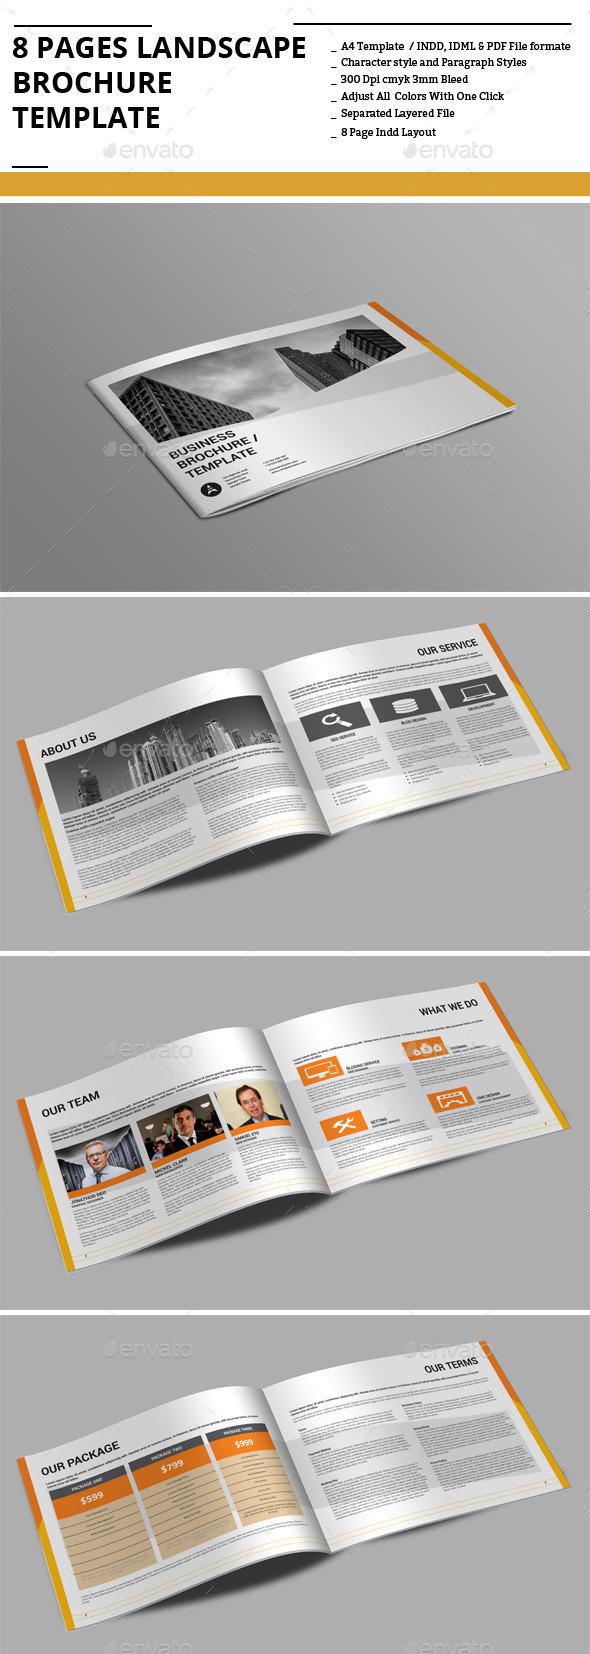 8 Pages Landscape sBrochure Template - Corporate Brochures